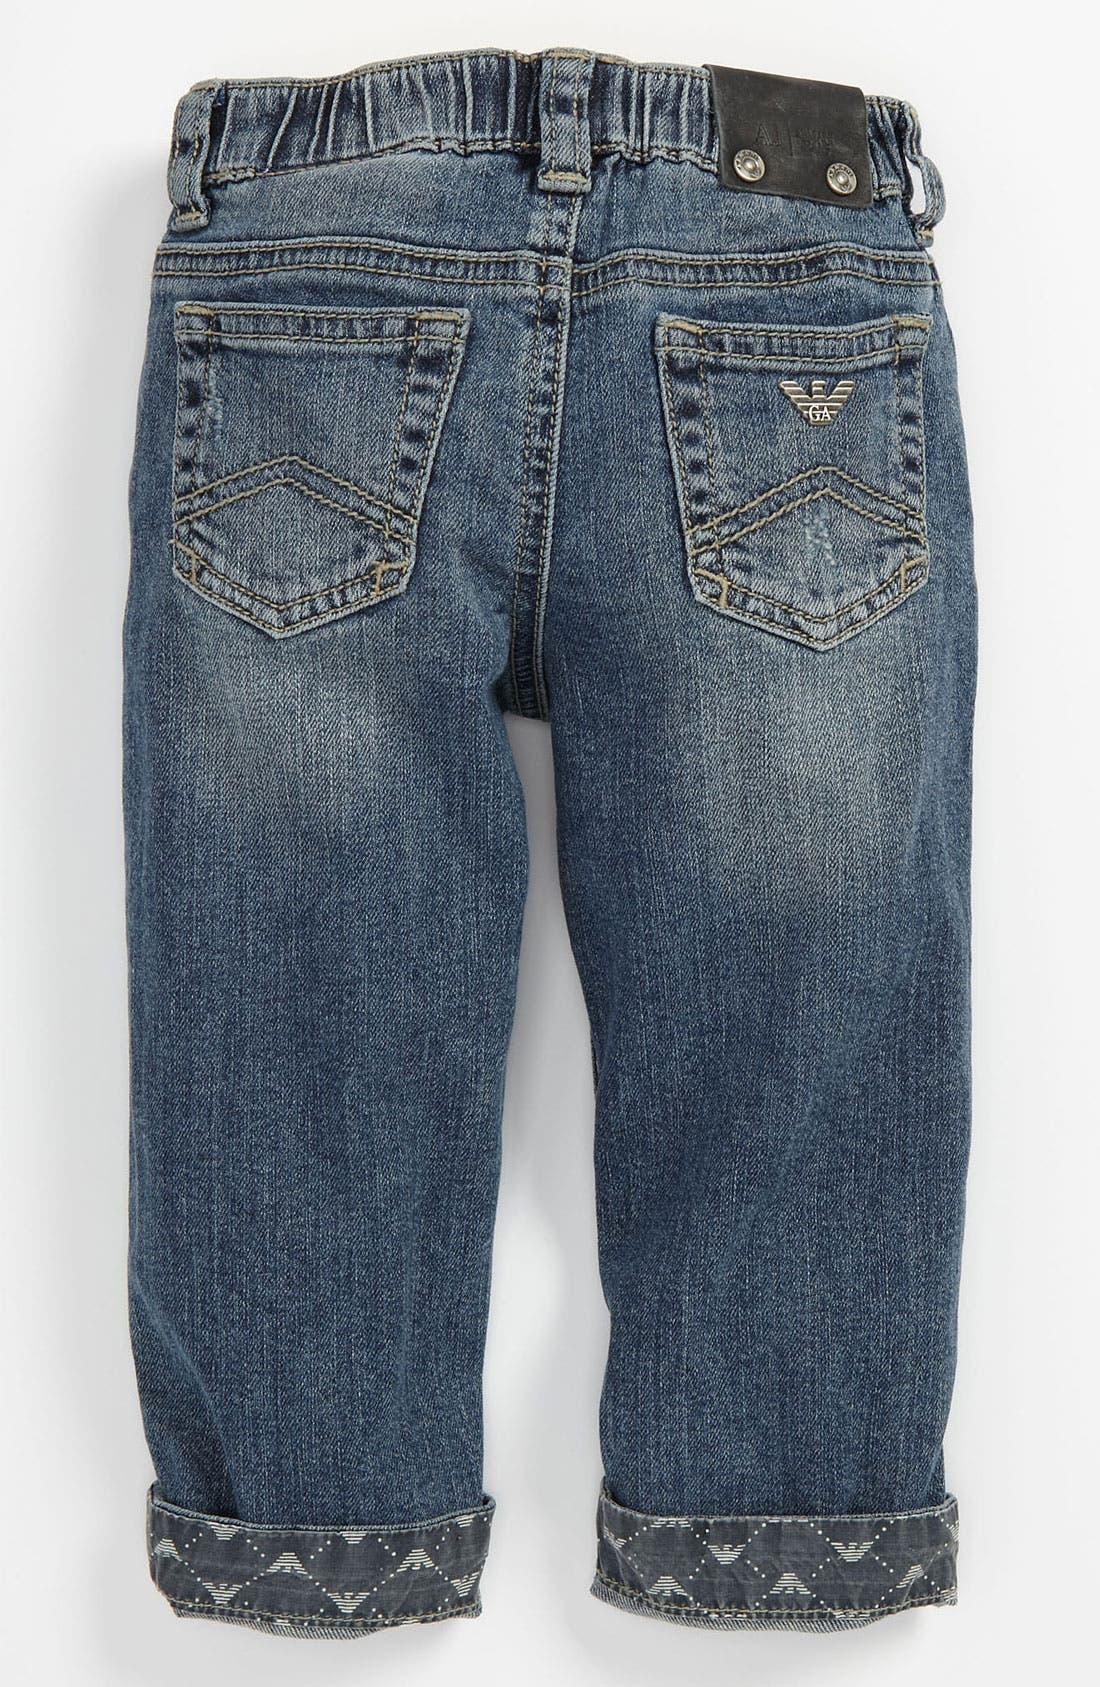 Alternate Image 1 Selected - Armani Junior Jeans (Baby)